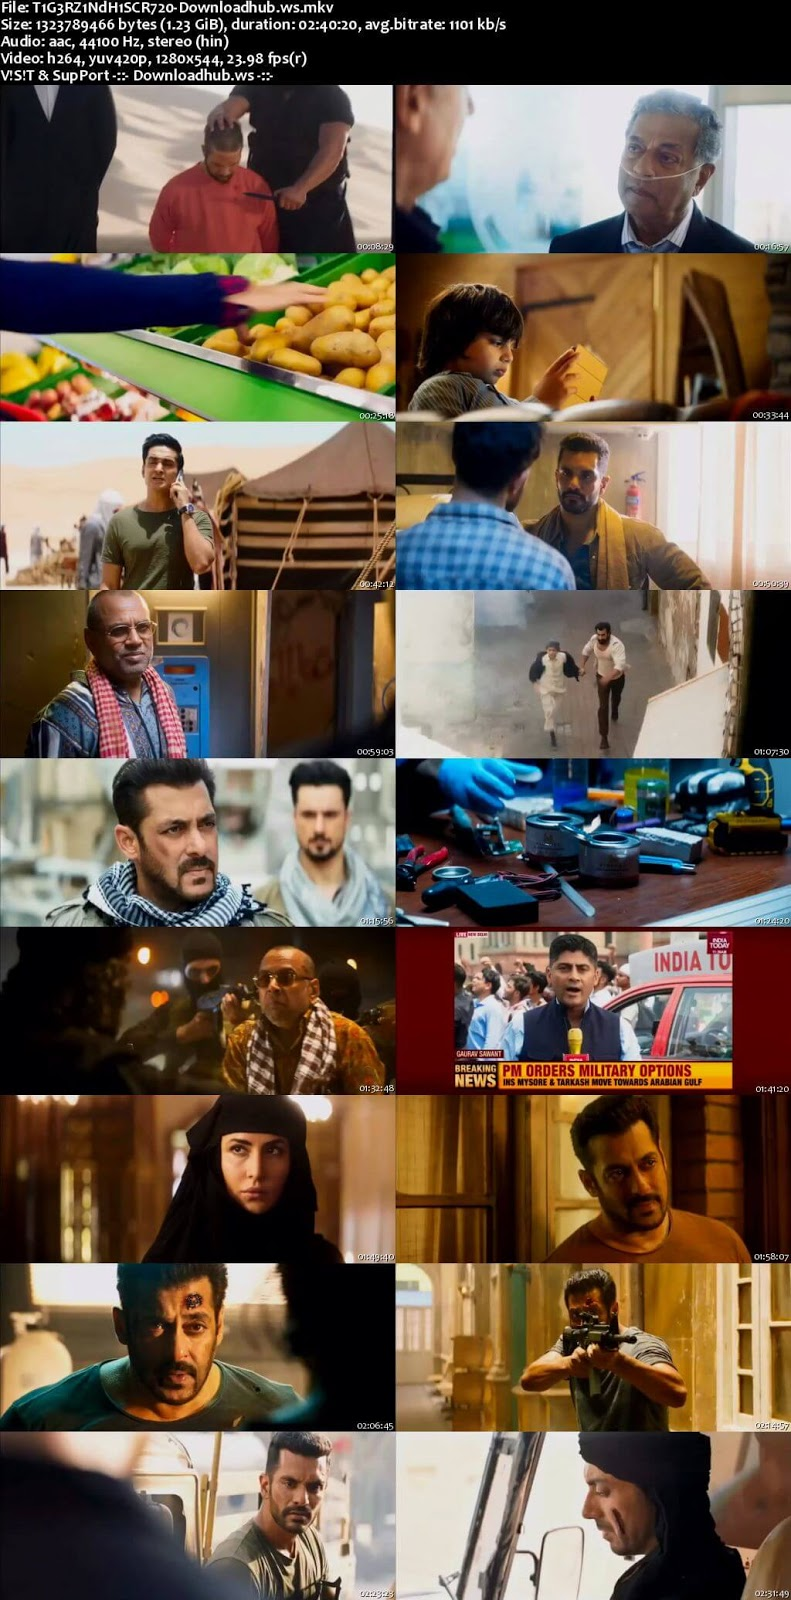 Tiger Zinda Hai 2017 Hindi 720p DVDScr x264